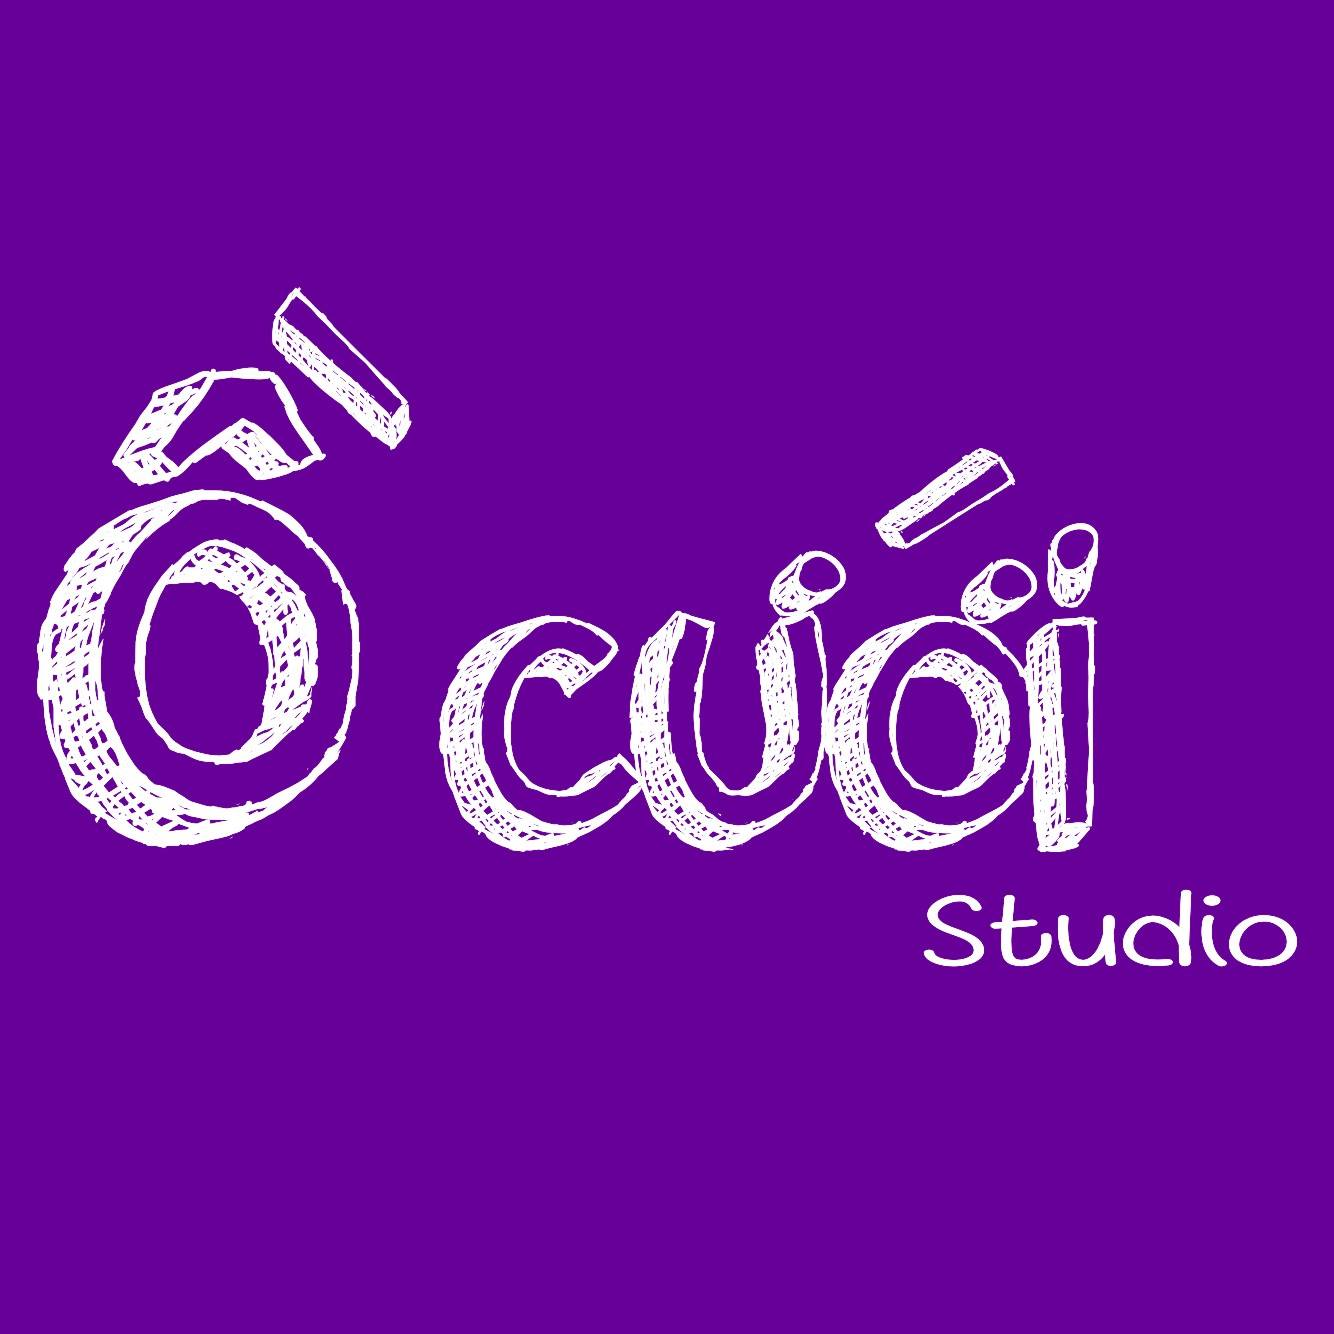 Ồ Cưới studio